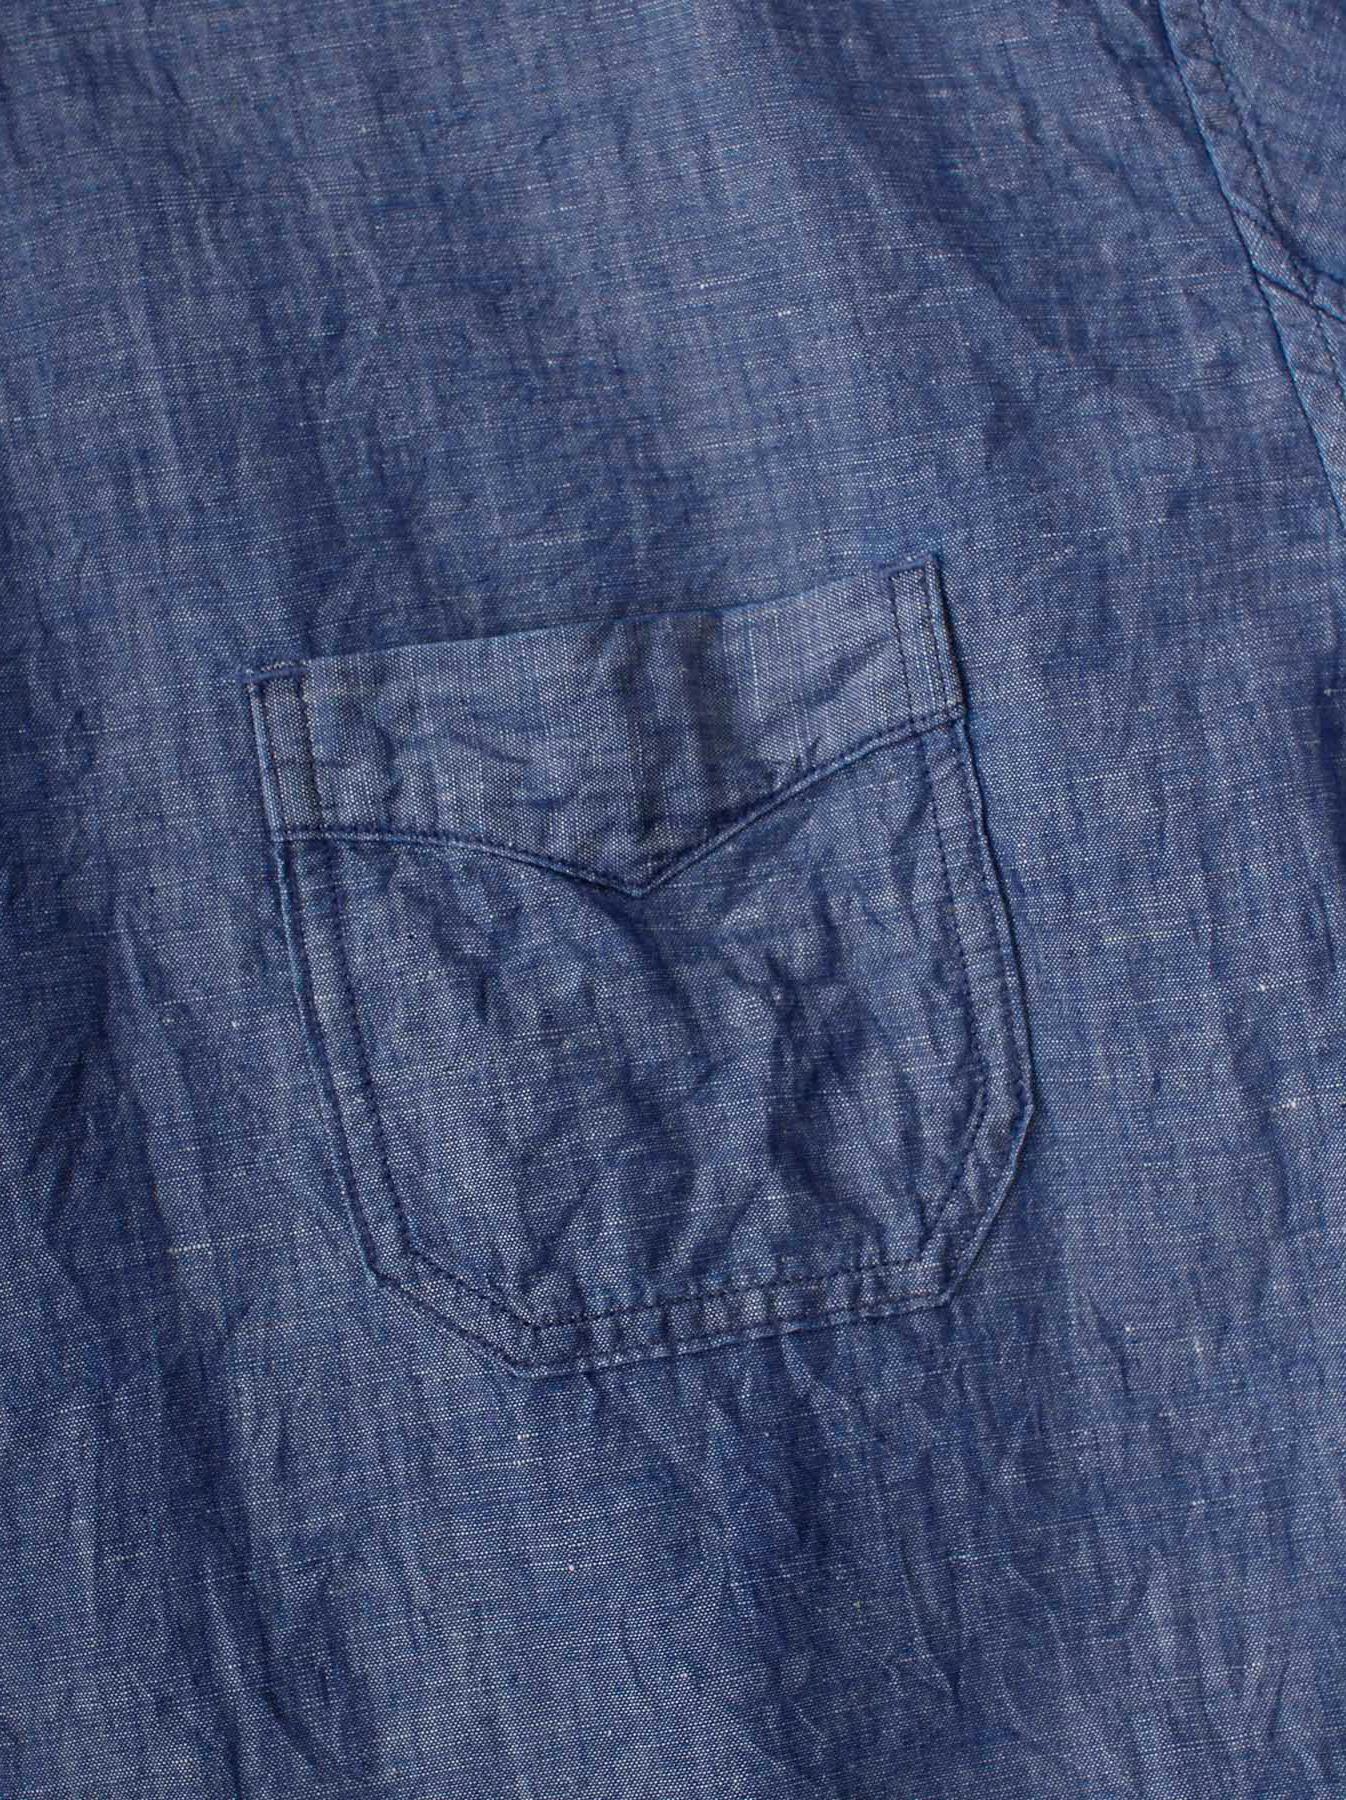 WH Cotton Linen Umahiko Pullover Shirt-8